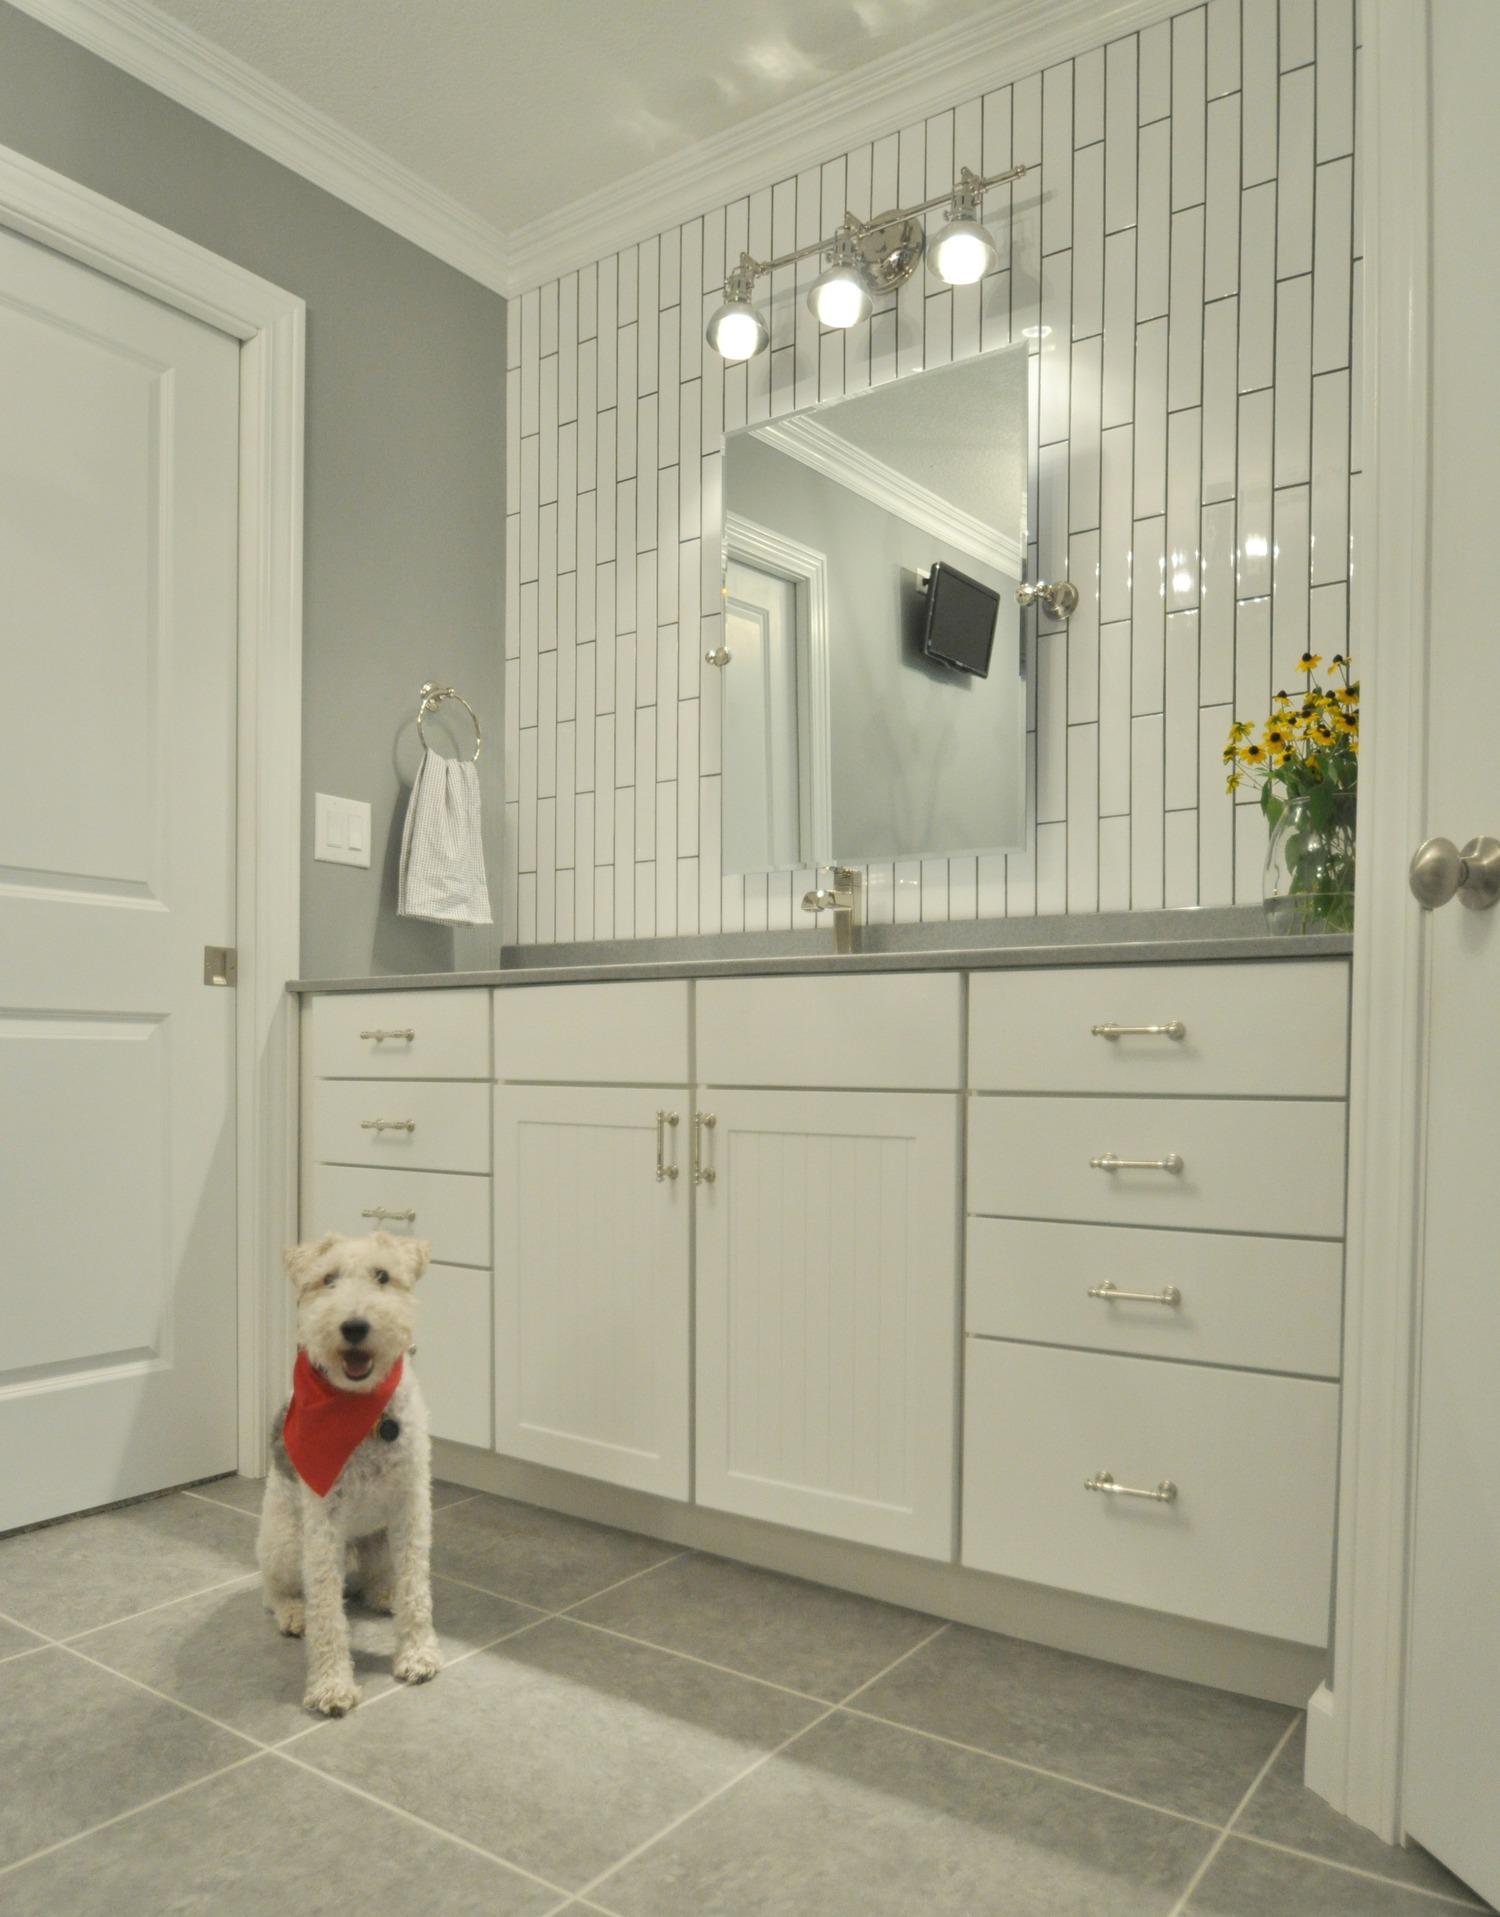 Master Bathroom Reveal — Decor and the Dog